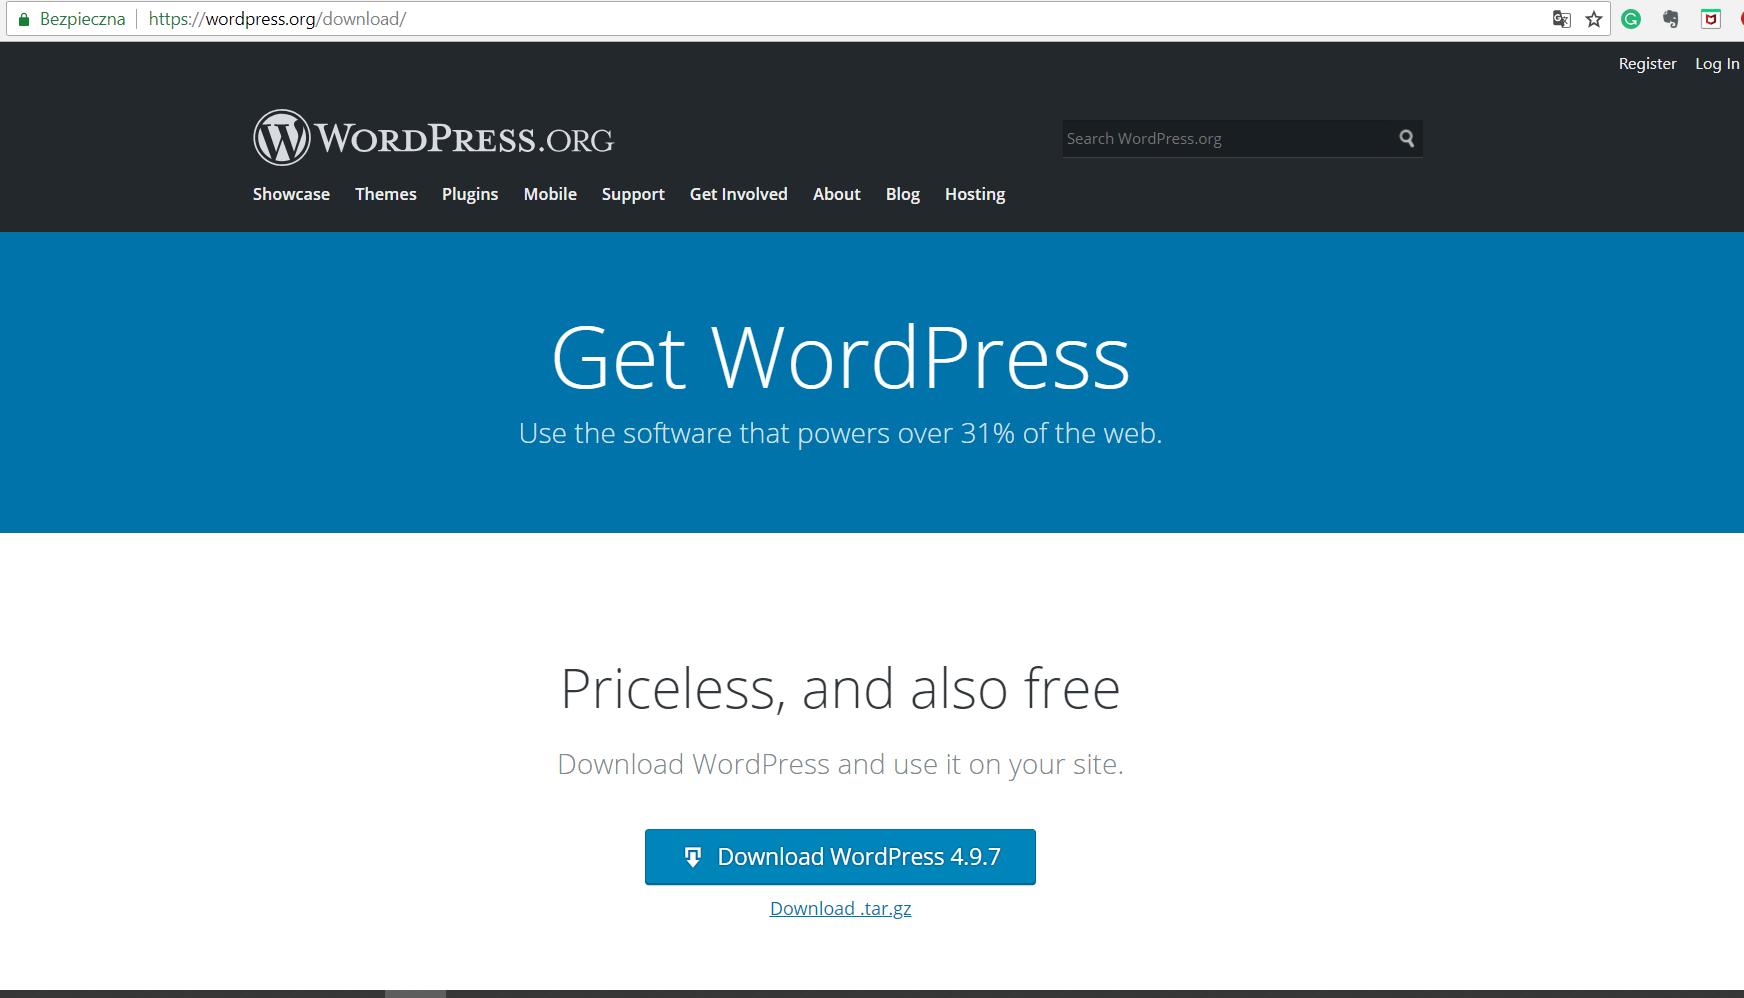 wordpress.org setup